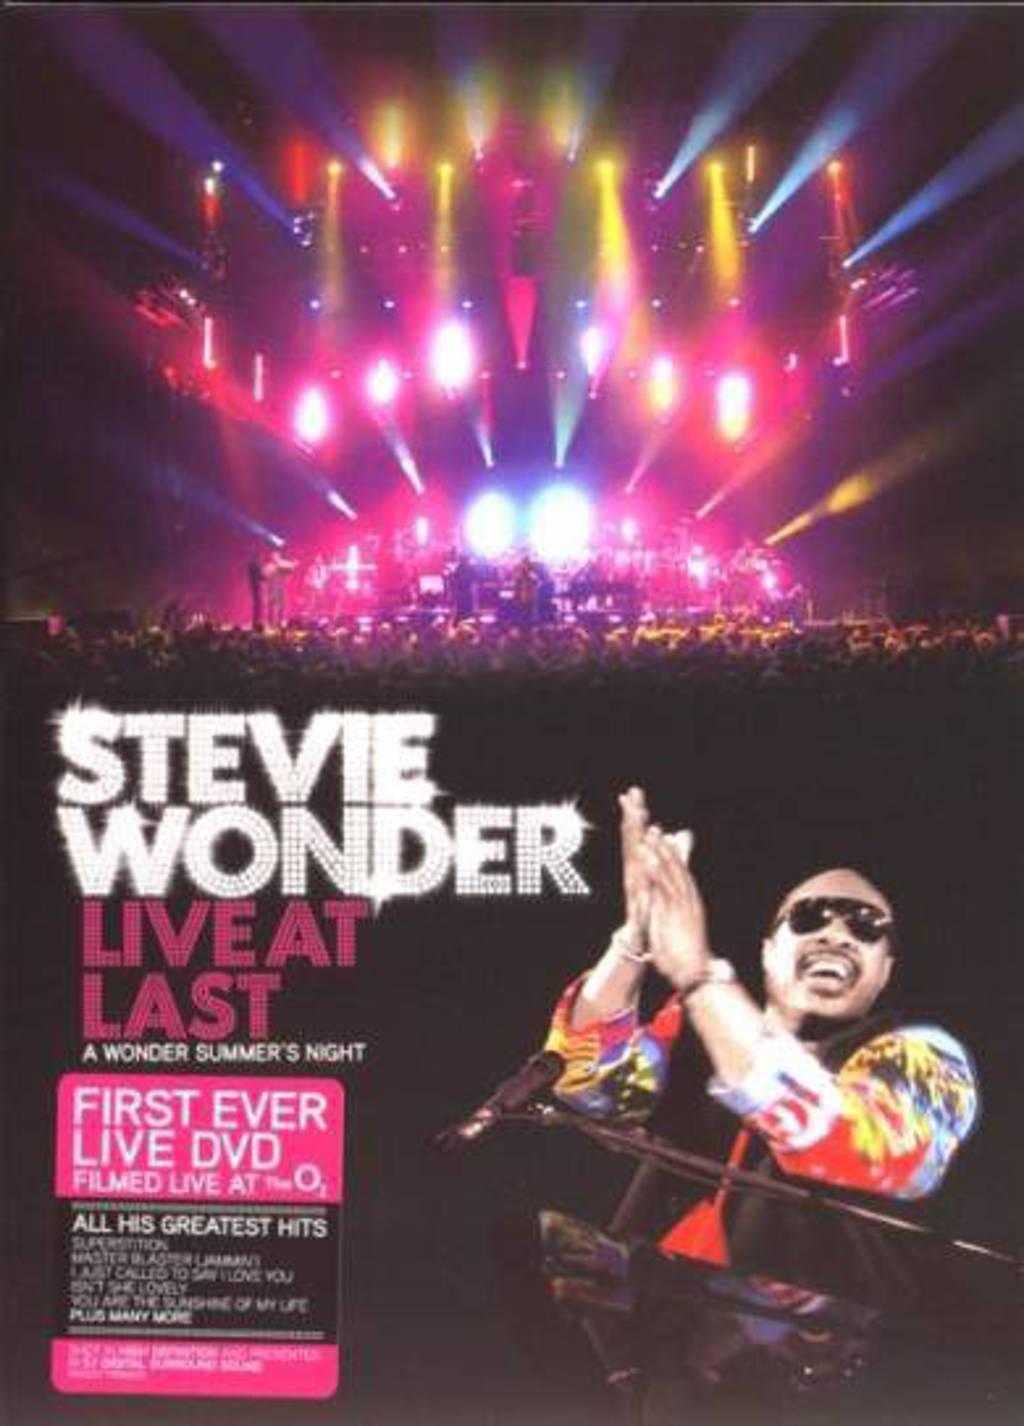 Stevie Wonder - Live At Last (DVD)